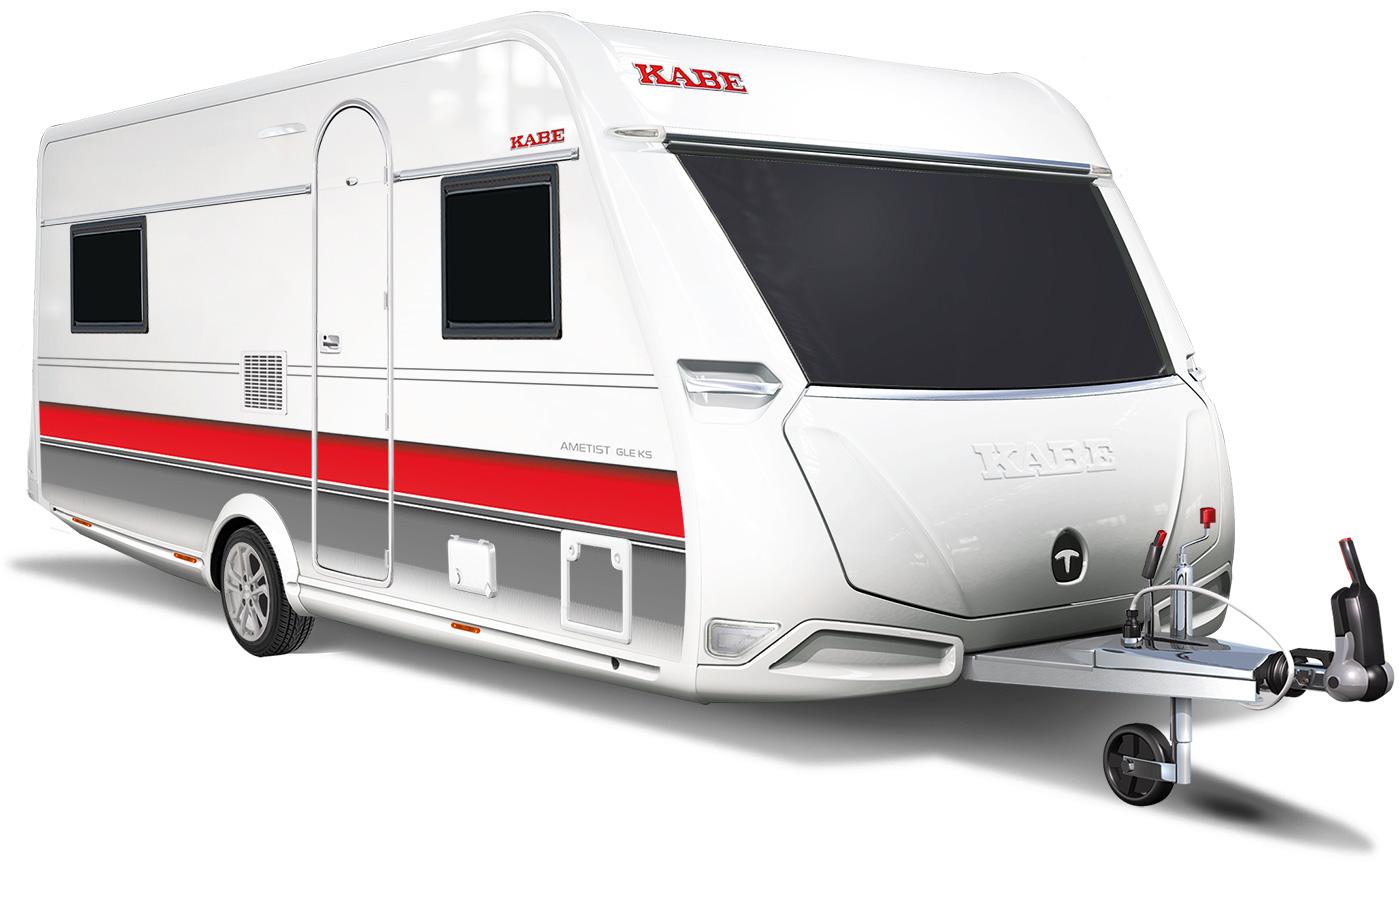 Kabe - Ametist 560 GLE